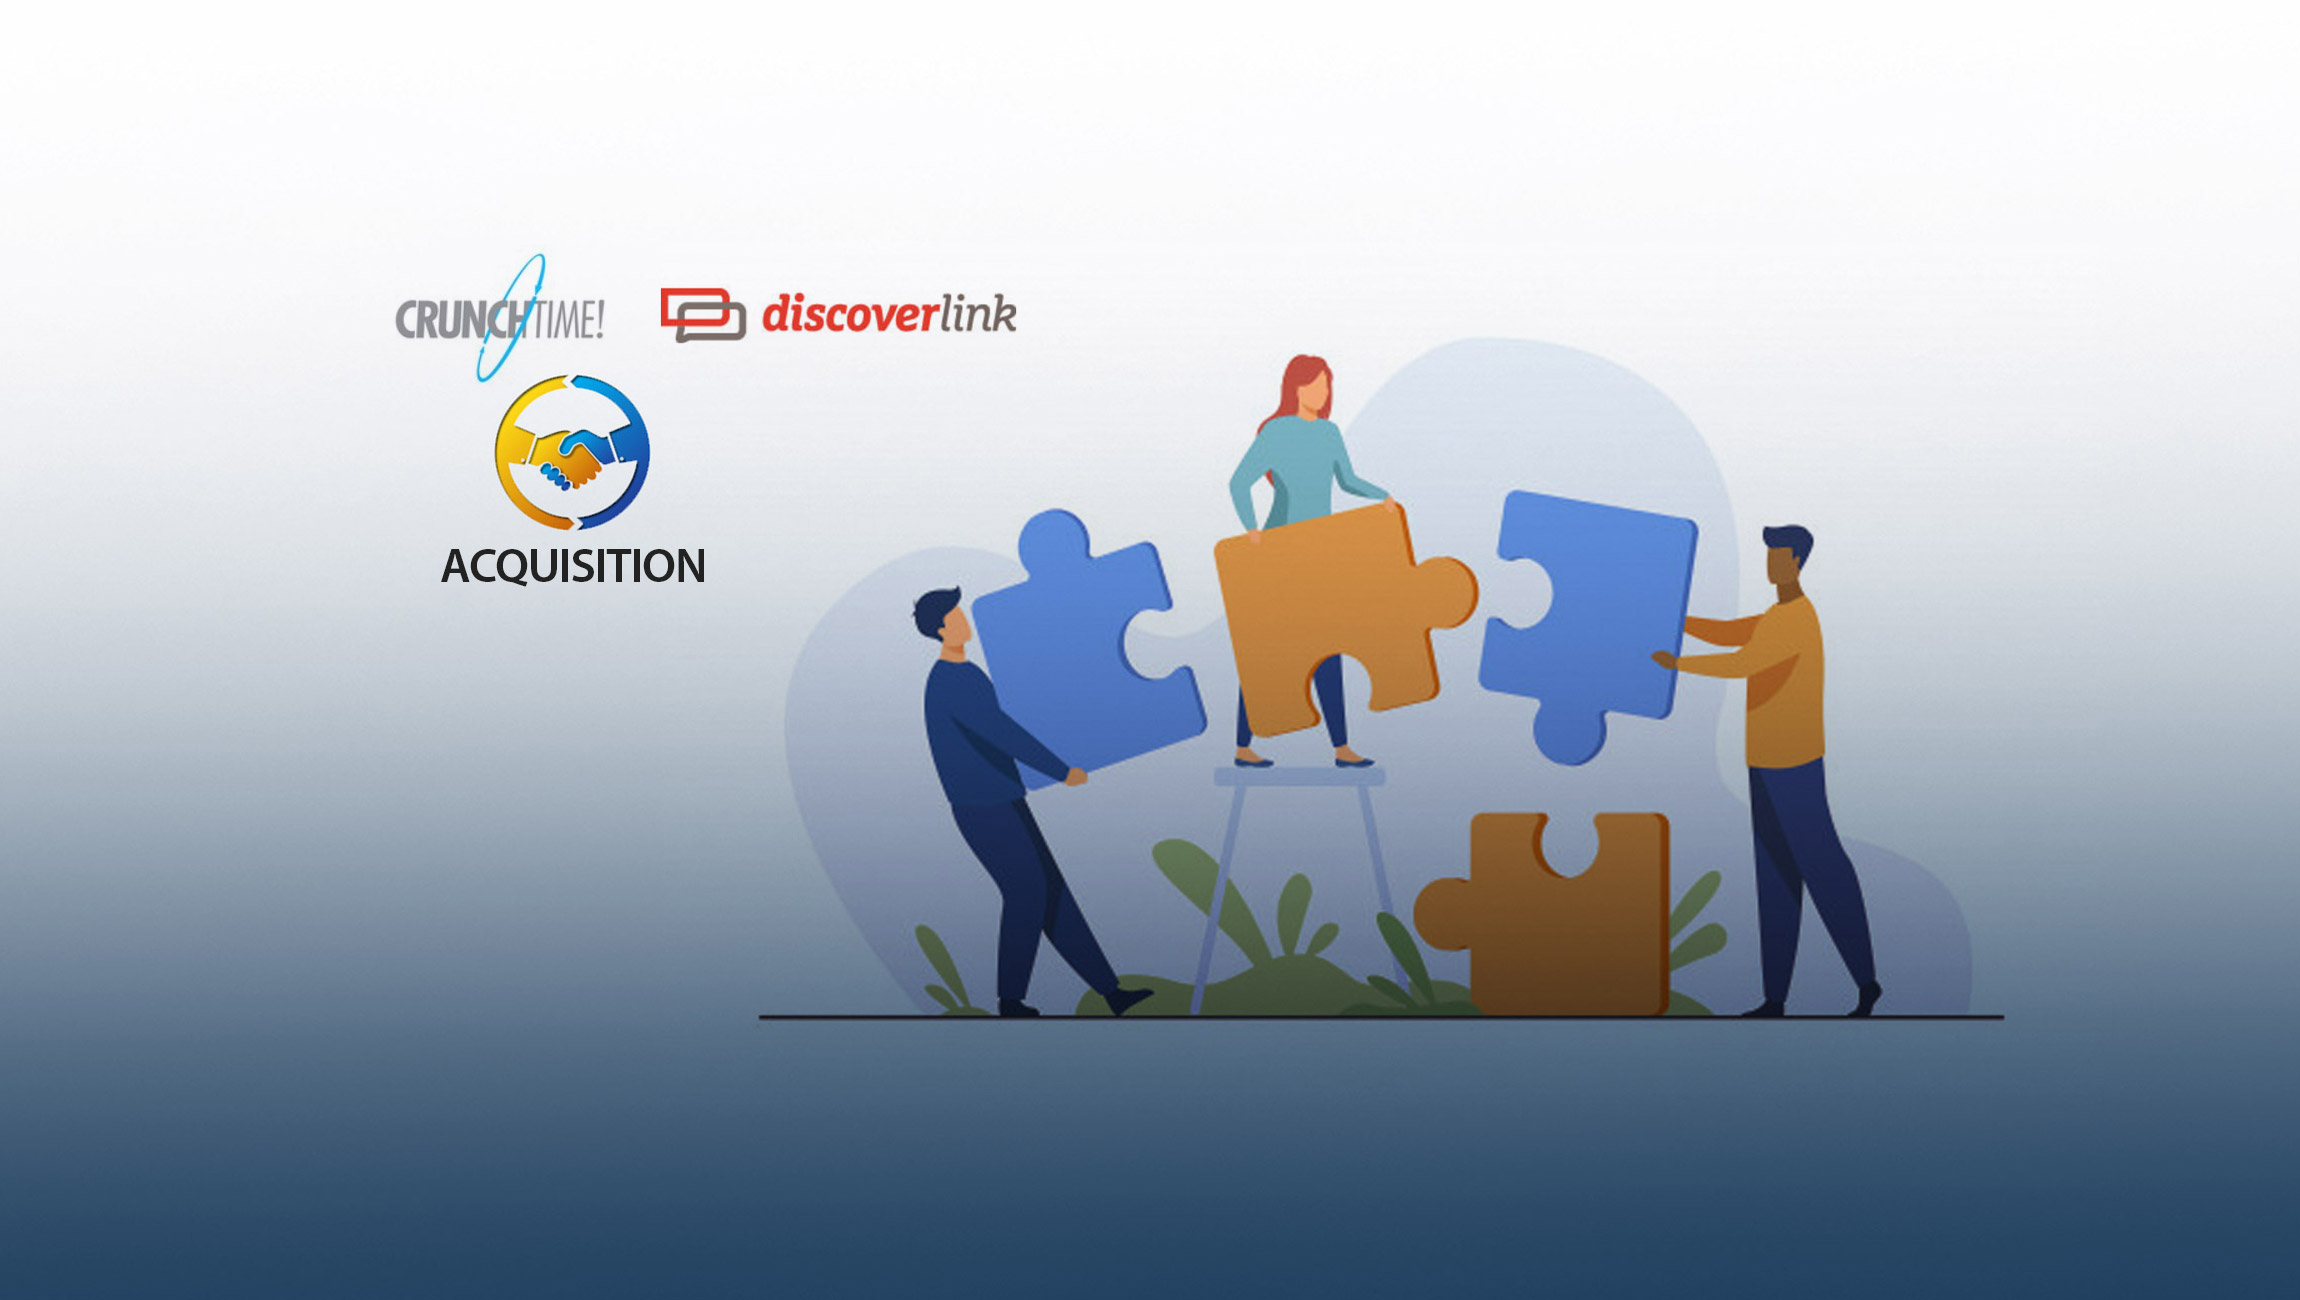 CrunchTime-Acquires-DiscoverLink_-Adding-Talent-Development-to-Its-Restaurant-Management-Platform